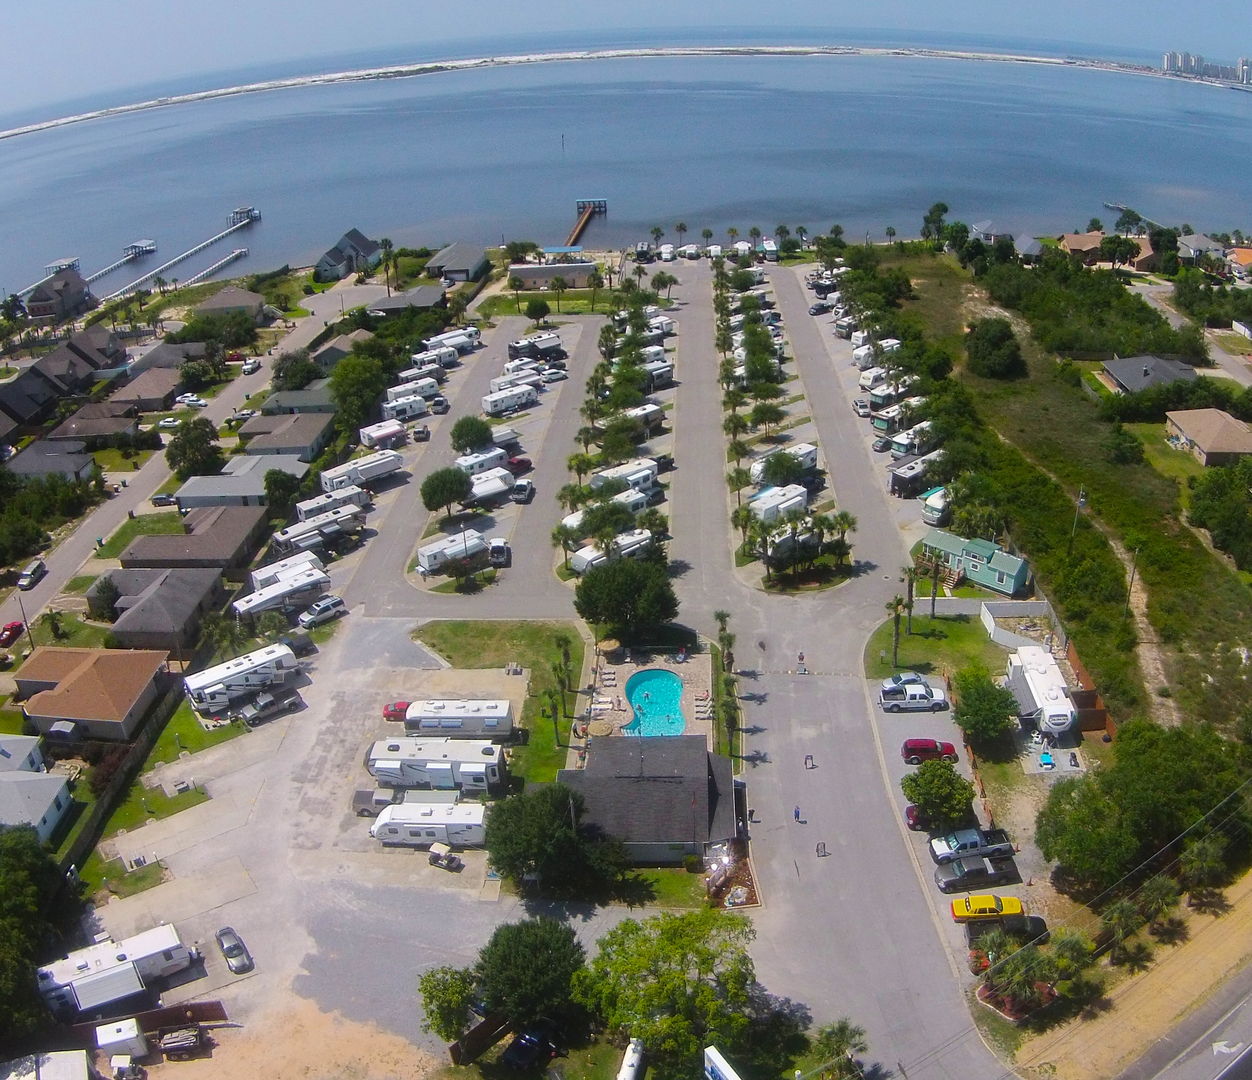 emerald beach rv park rv sites florida campgrounds rv resorts emerald beach rv park rv sites florida campgrounds rv resorts in florida